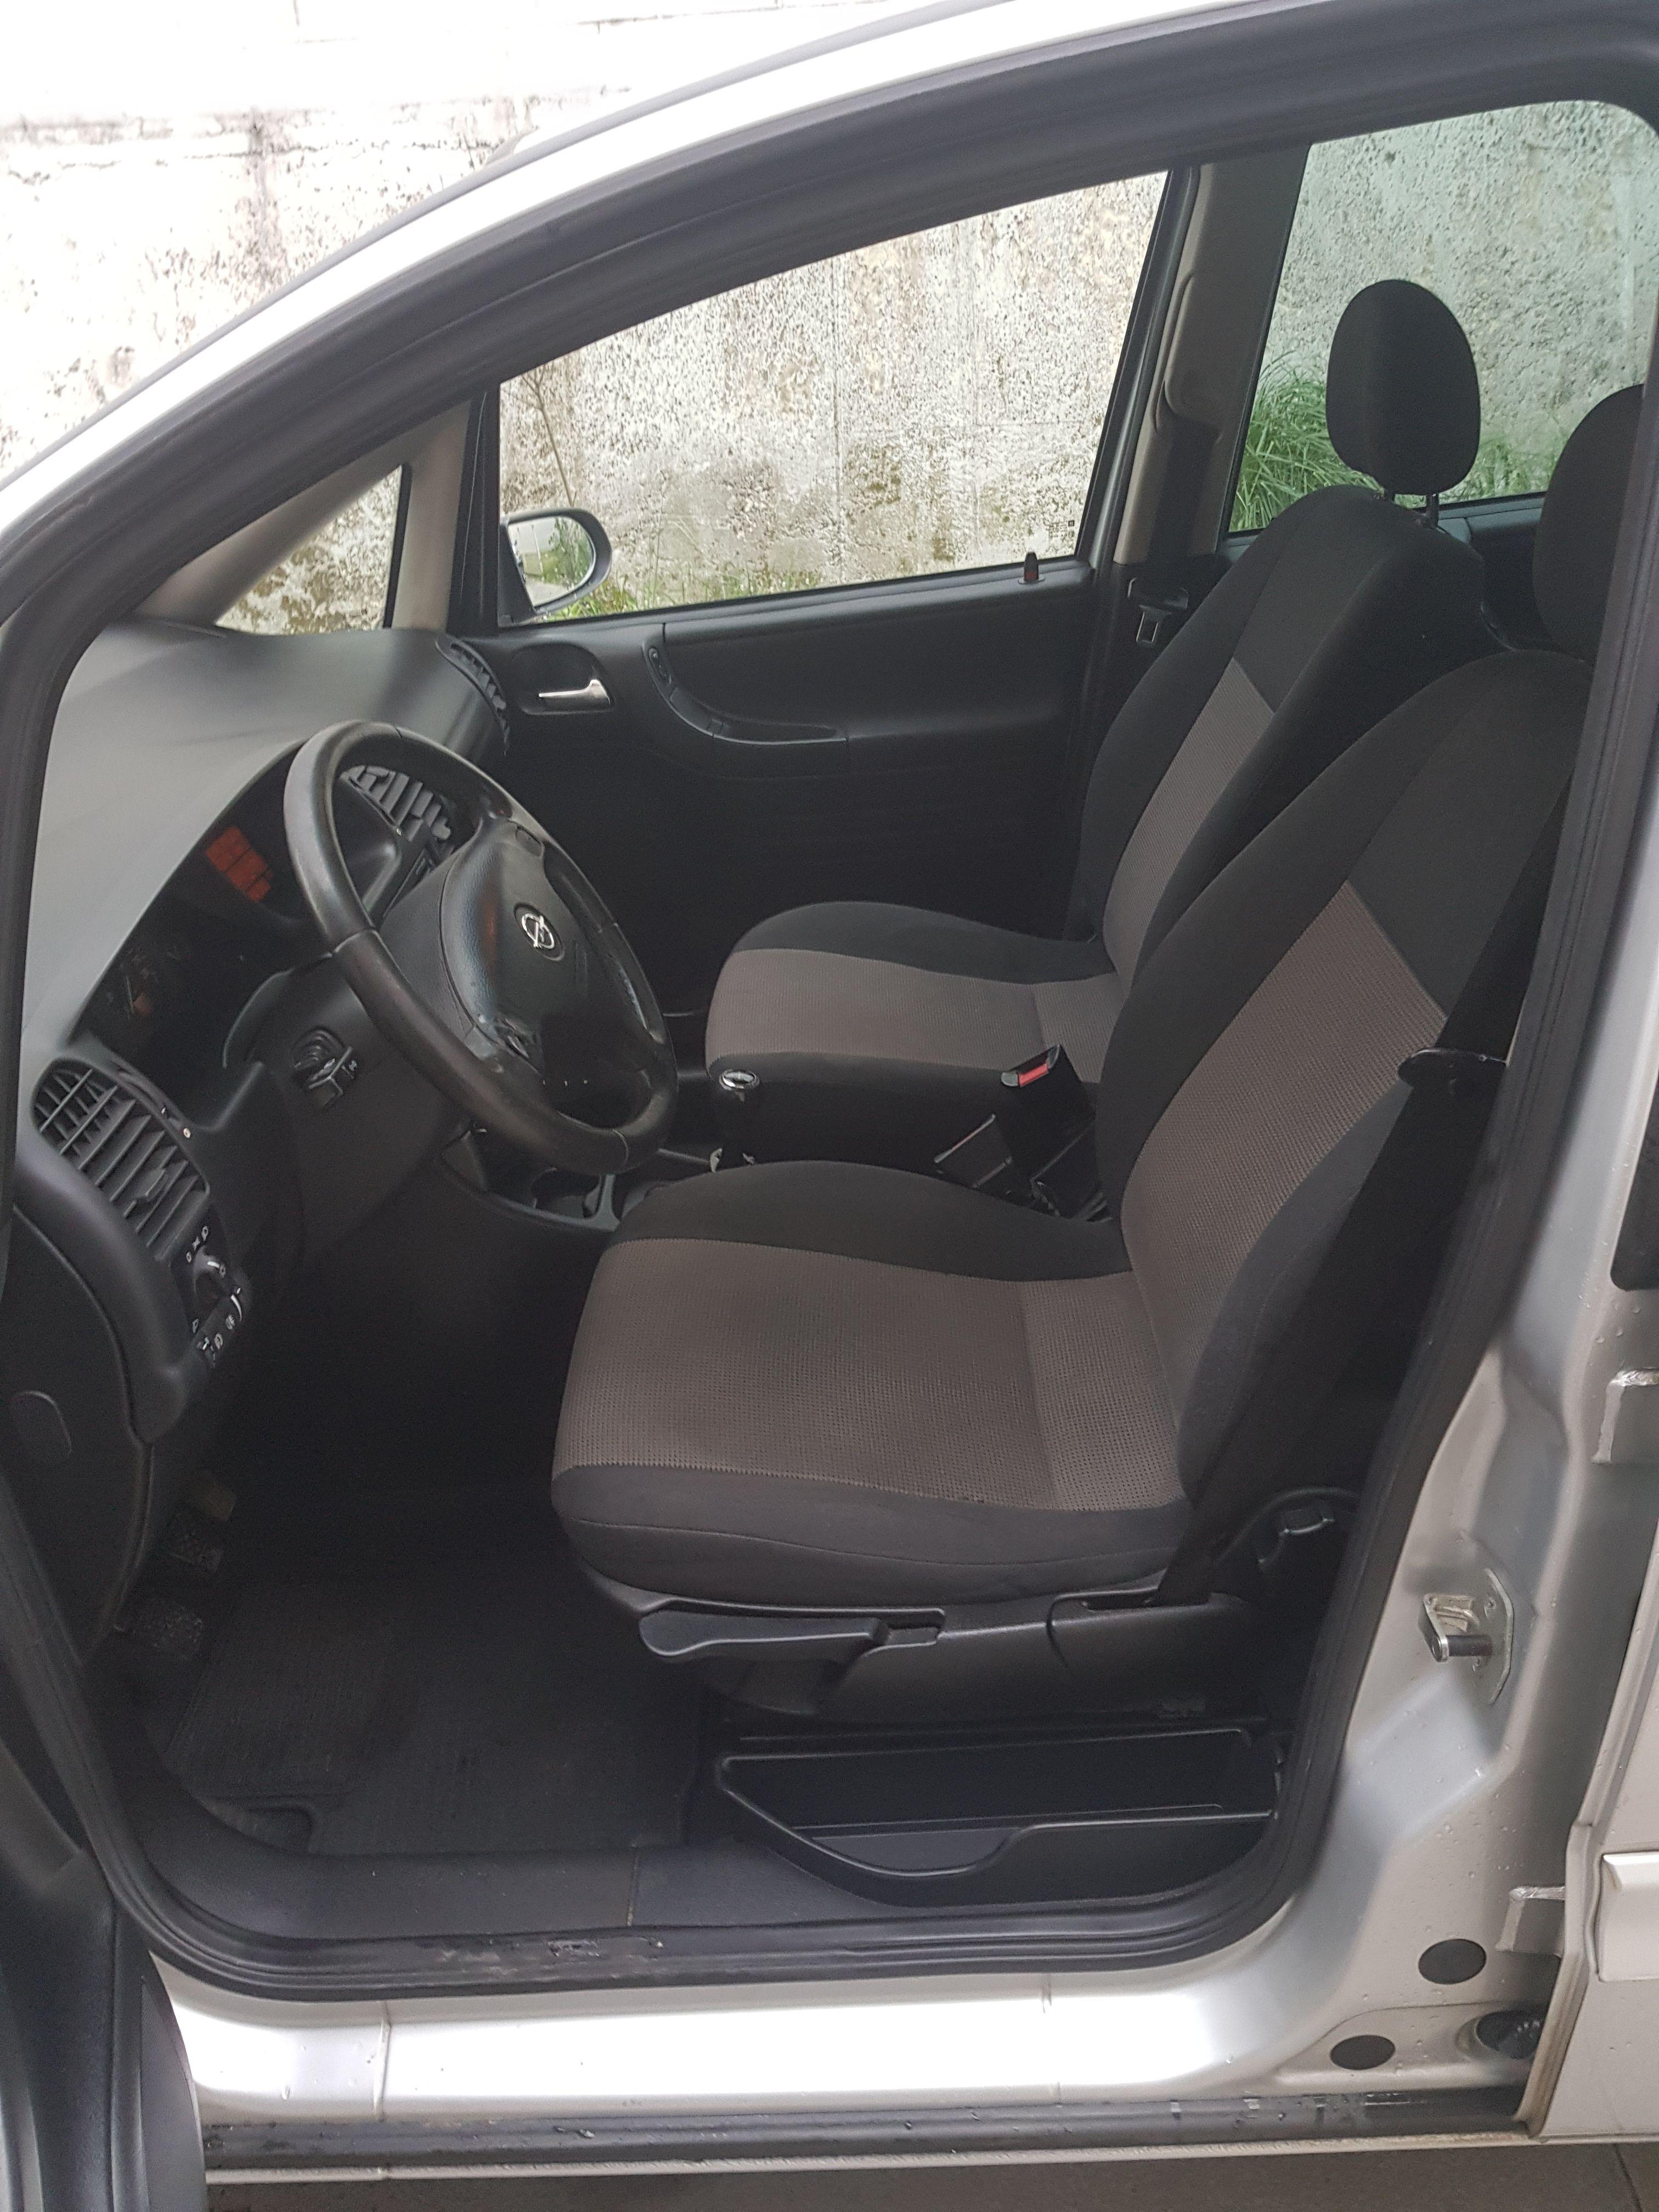 Opel Zafira R Line 2. 0 dti 100cv: Servicios de Asua-Berri Motor Old School